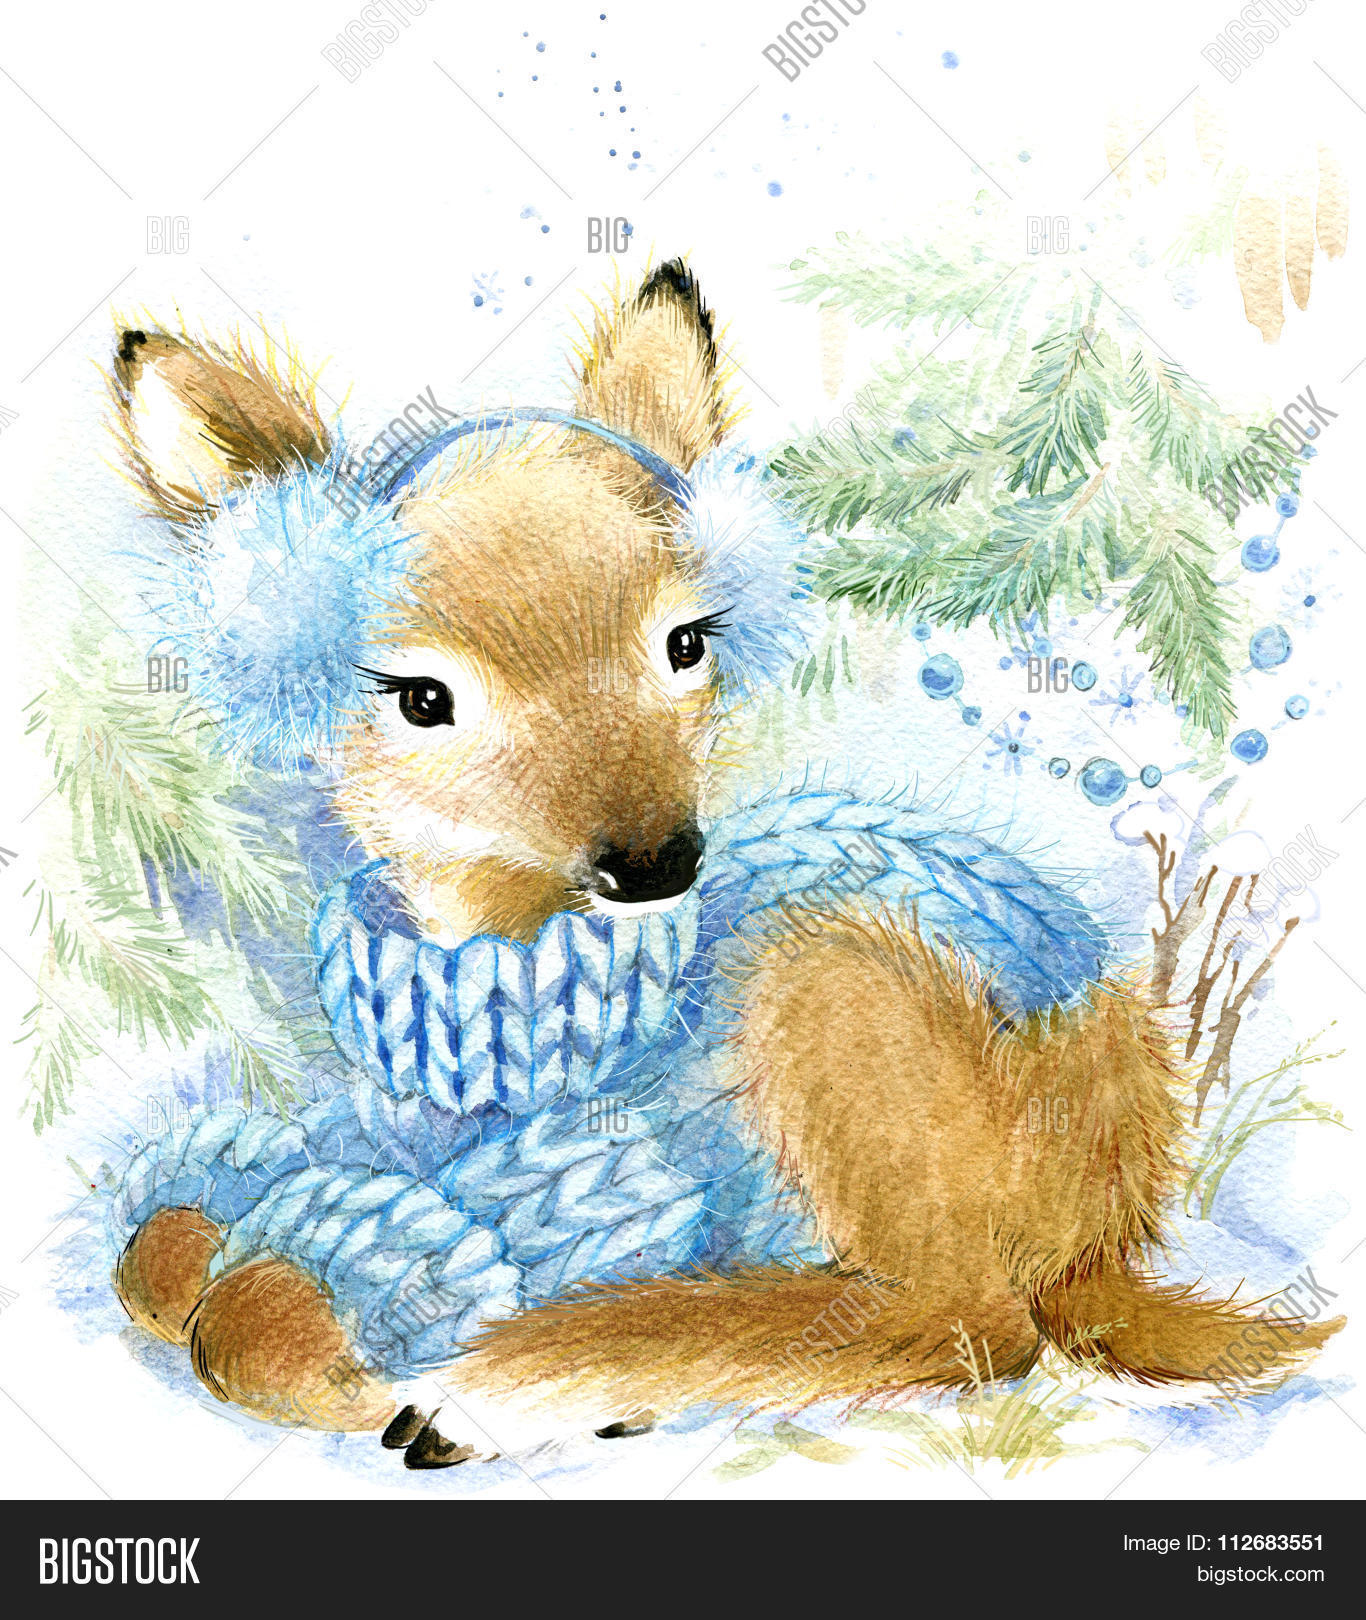 1366x1620 Cute Baby Deer Winter Forest. Cute Image amp Photo Bigstock